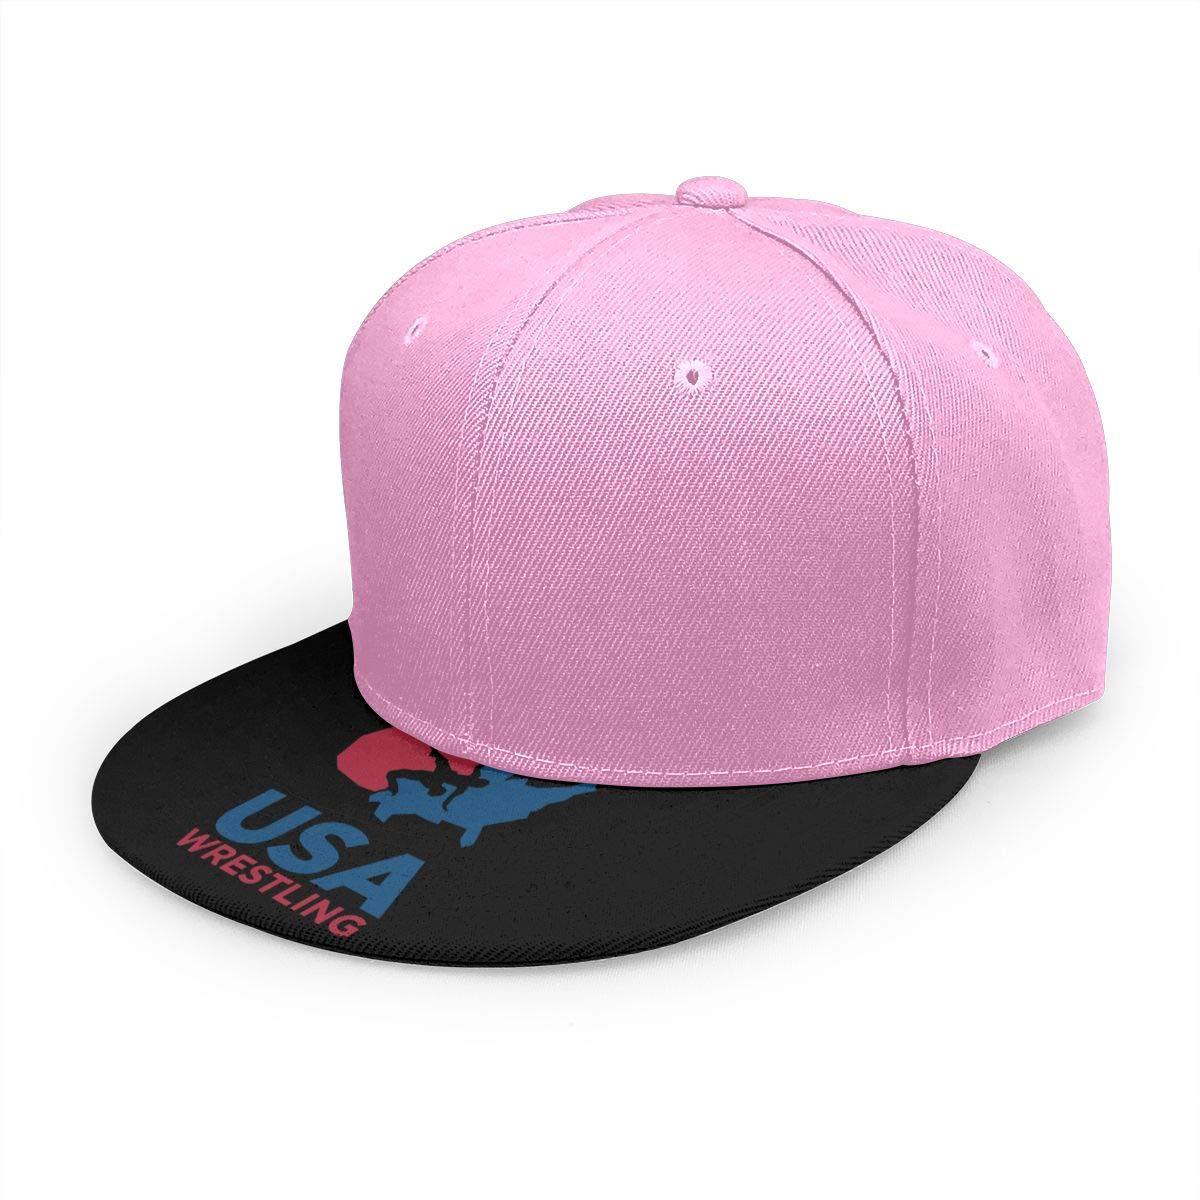 Adjustable Women Men USA Wrestling Logo Print Baseball Cap Flat Brim Cap Hats Hip Hop Snapback Sun Hat Boys Girls Pink by Apolonia